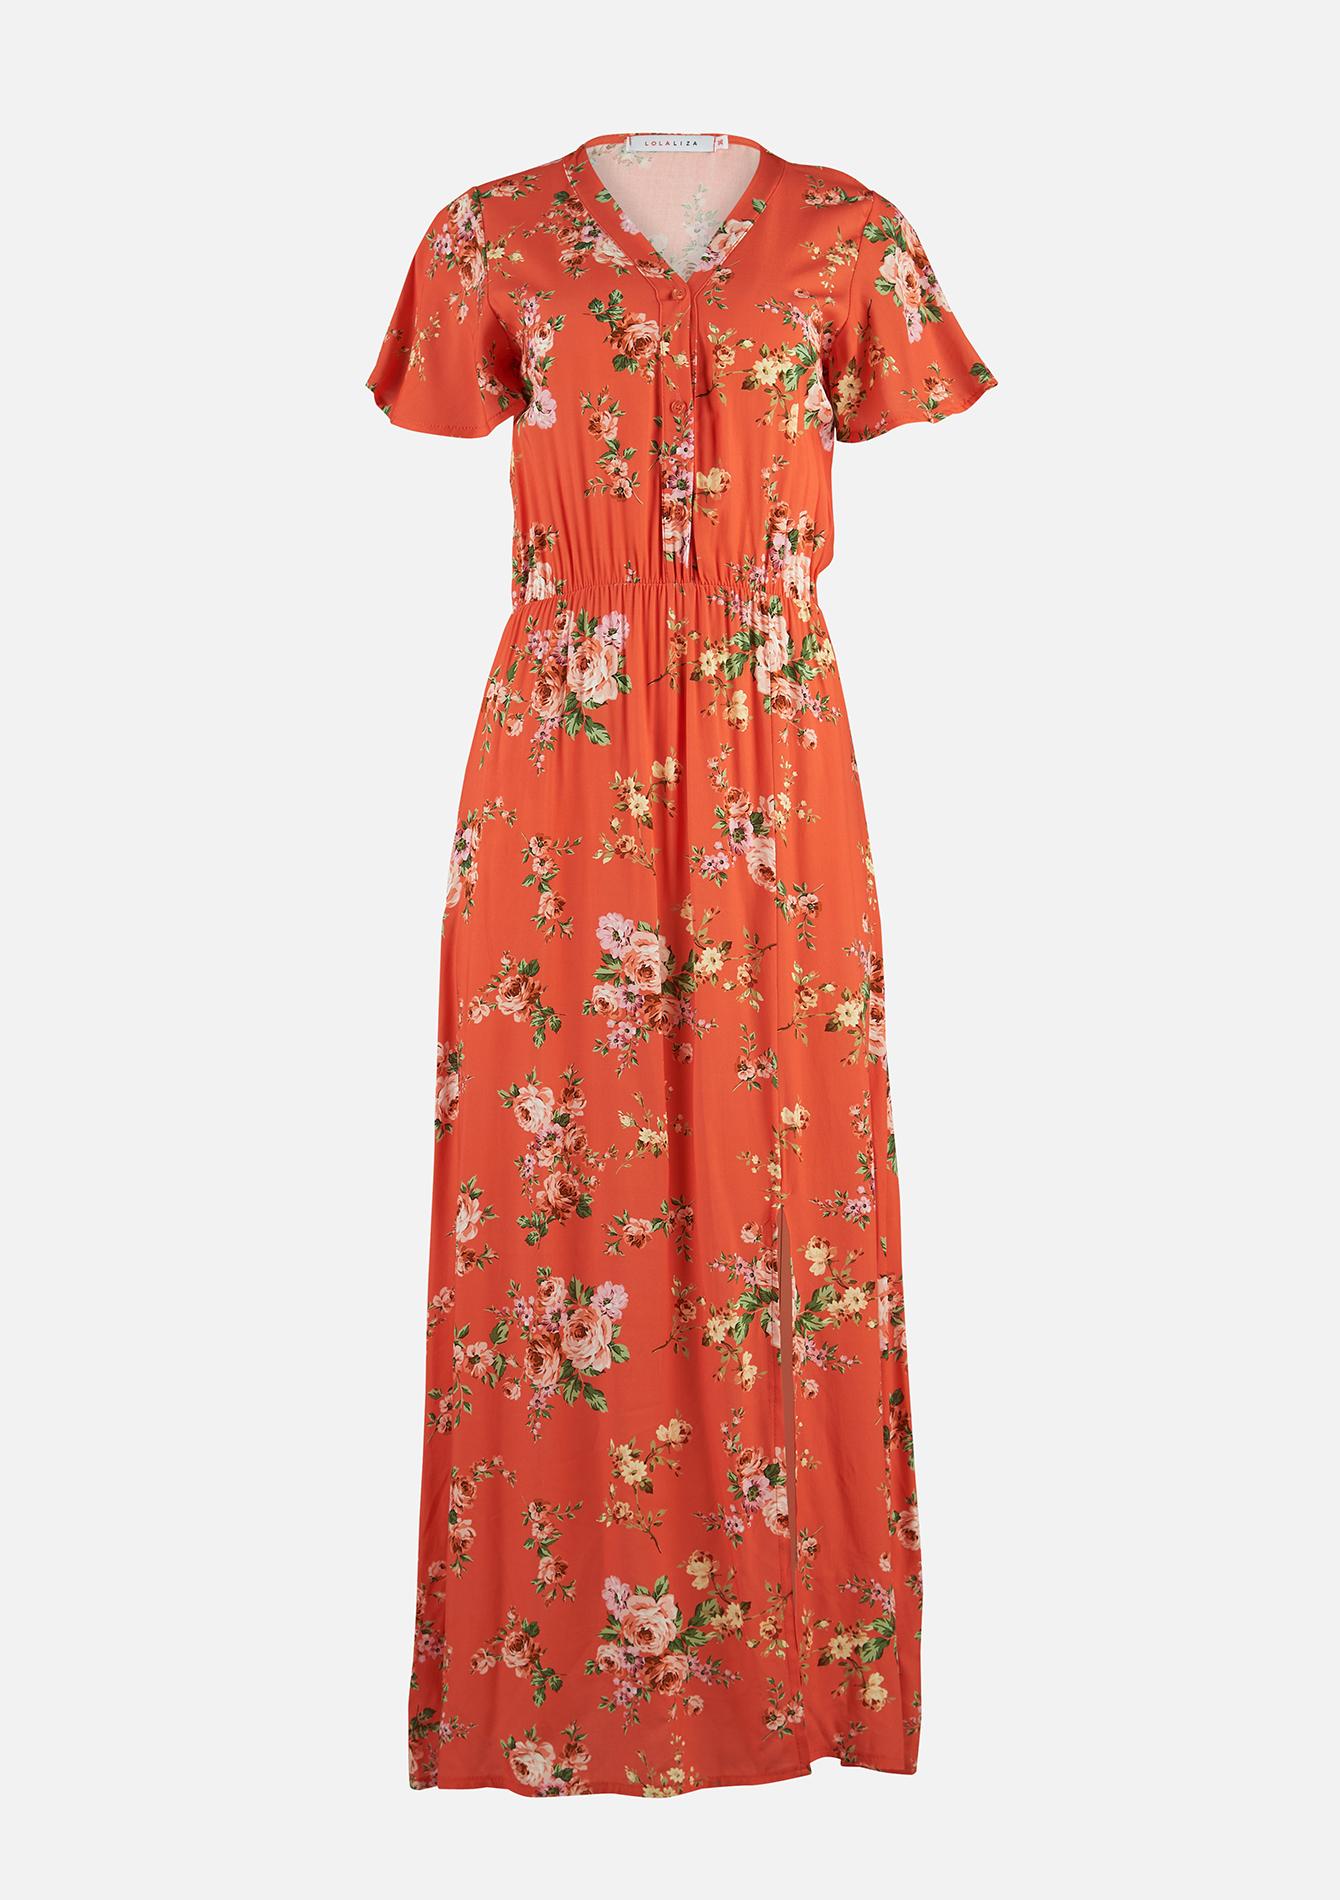 Maxi jurk met bloemenprint - CORAL SALMONE - 08601114_5409